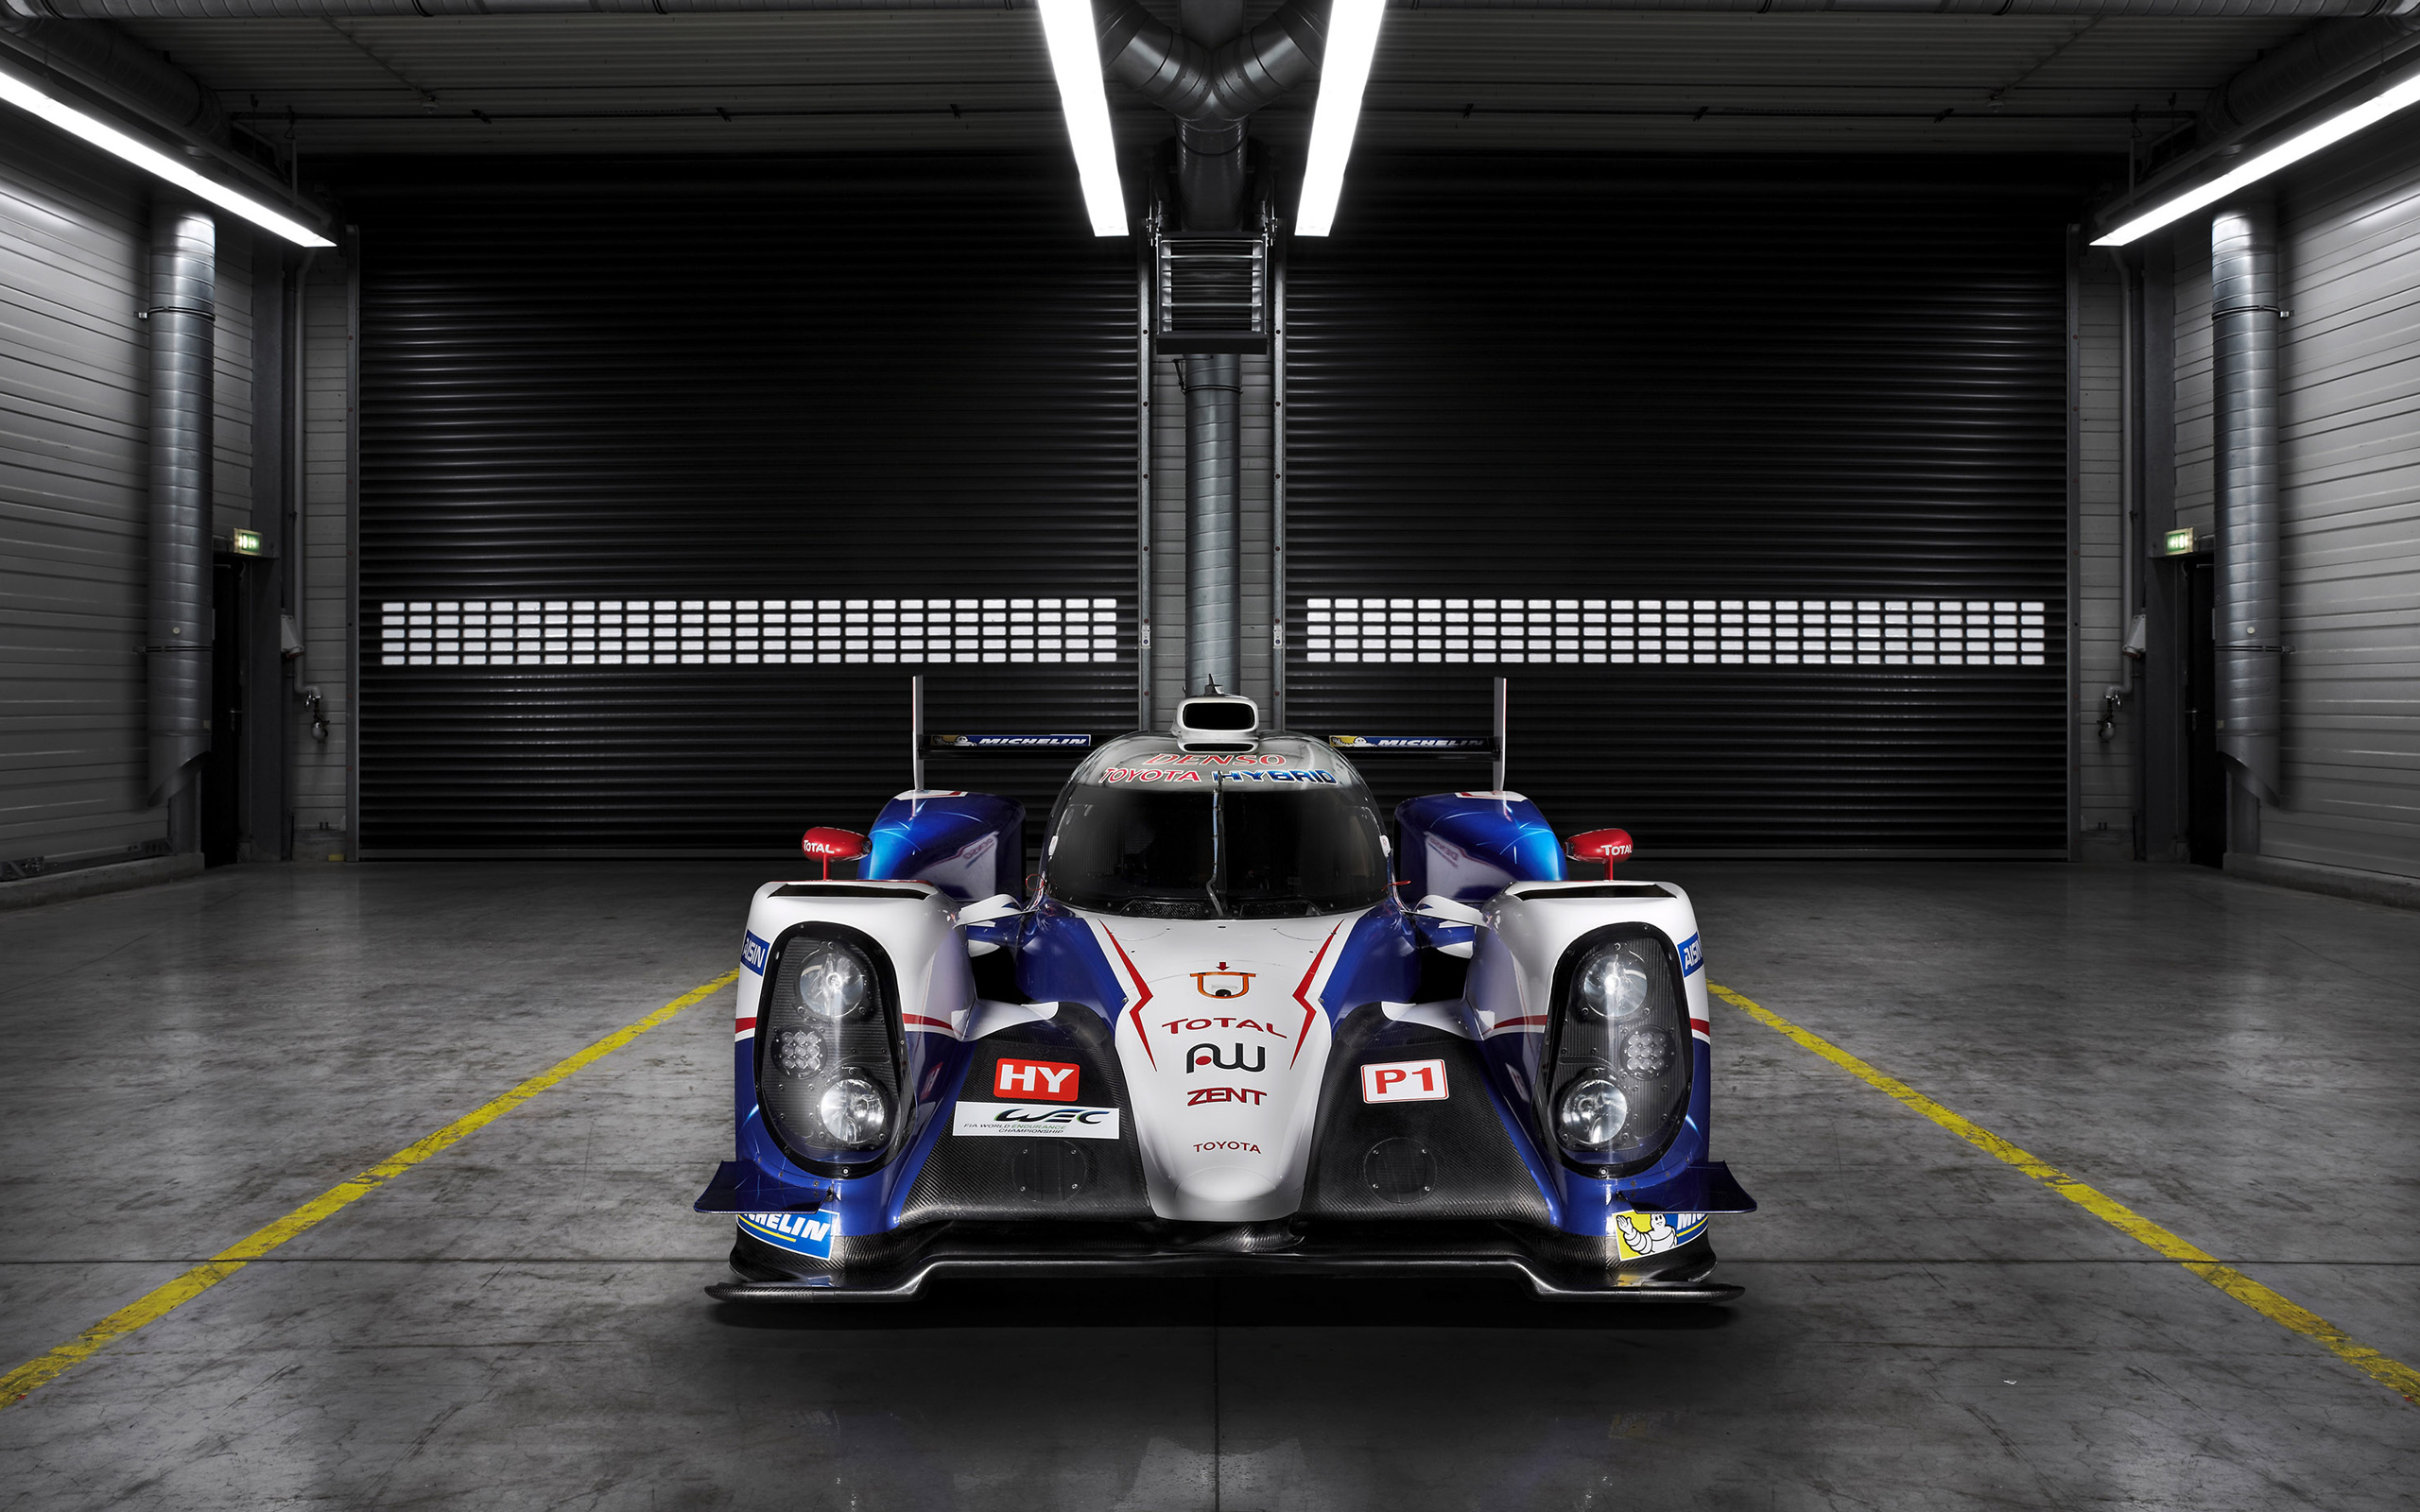 toyota ts040 hybrid race car front view wallpaper 47721